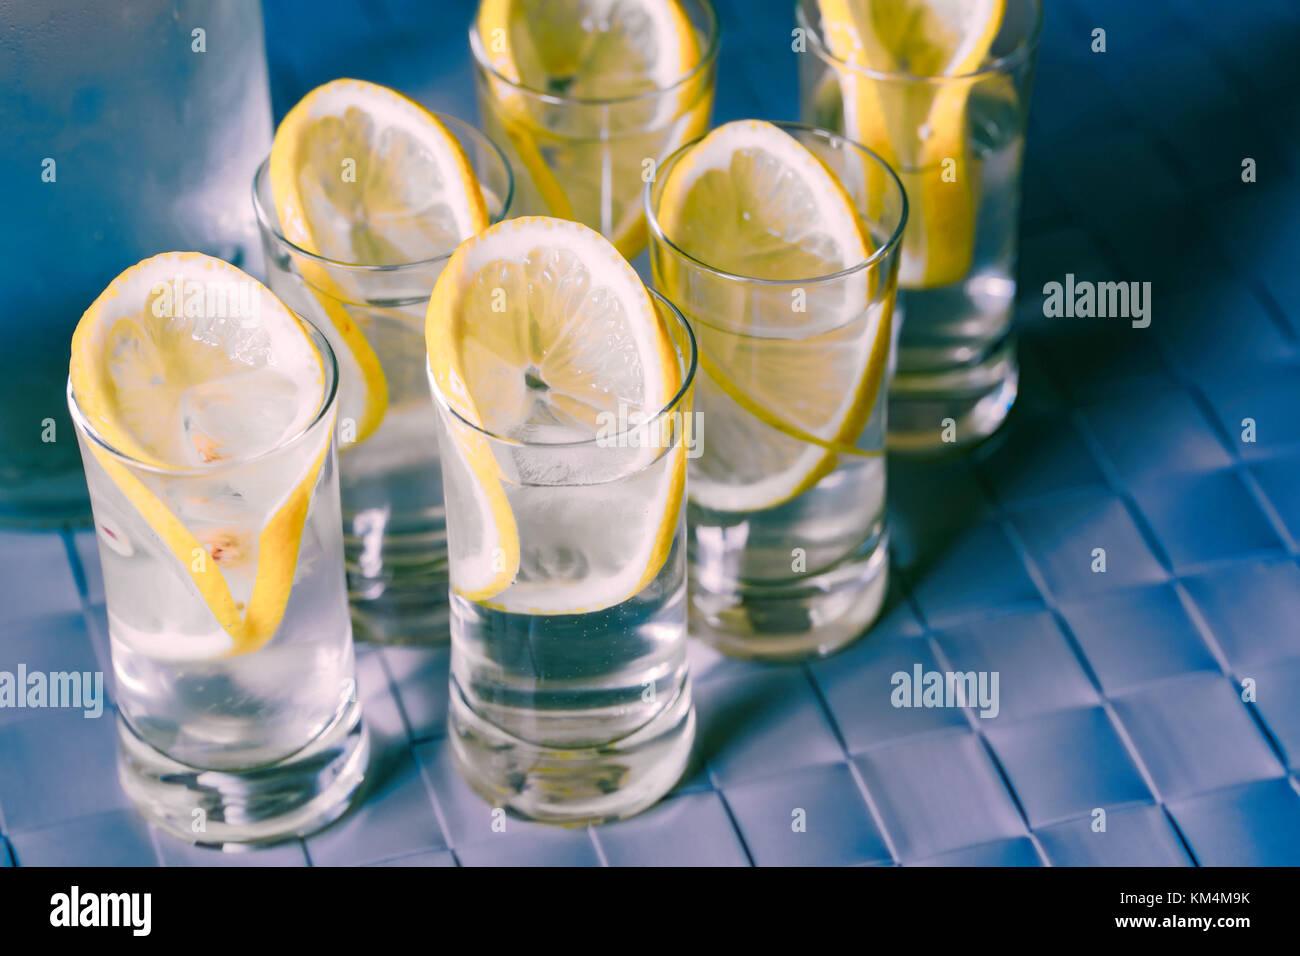 Vodka shot glass and lemon on blue surface - Stock Image